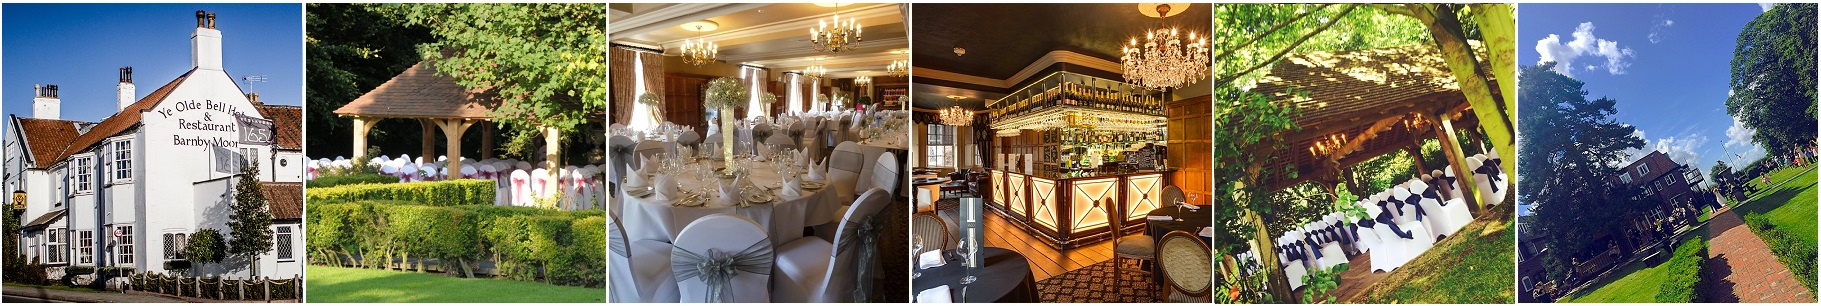 Ye Olde Bell Photos - Nottinghamshire Wedding Venues